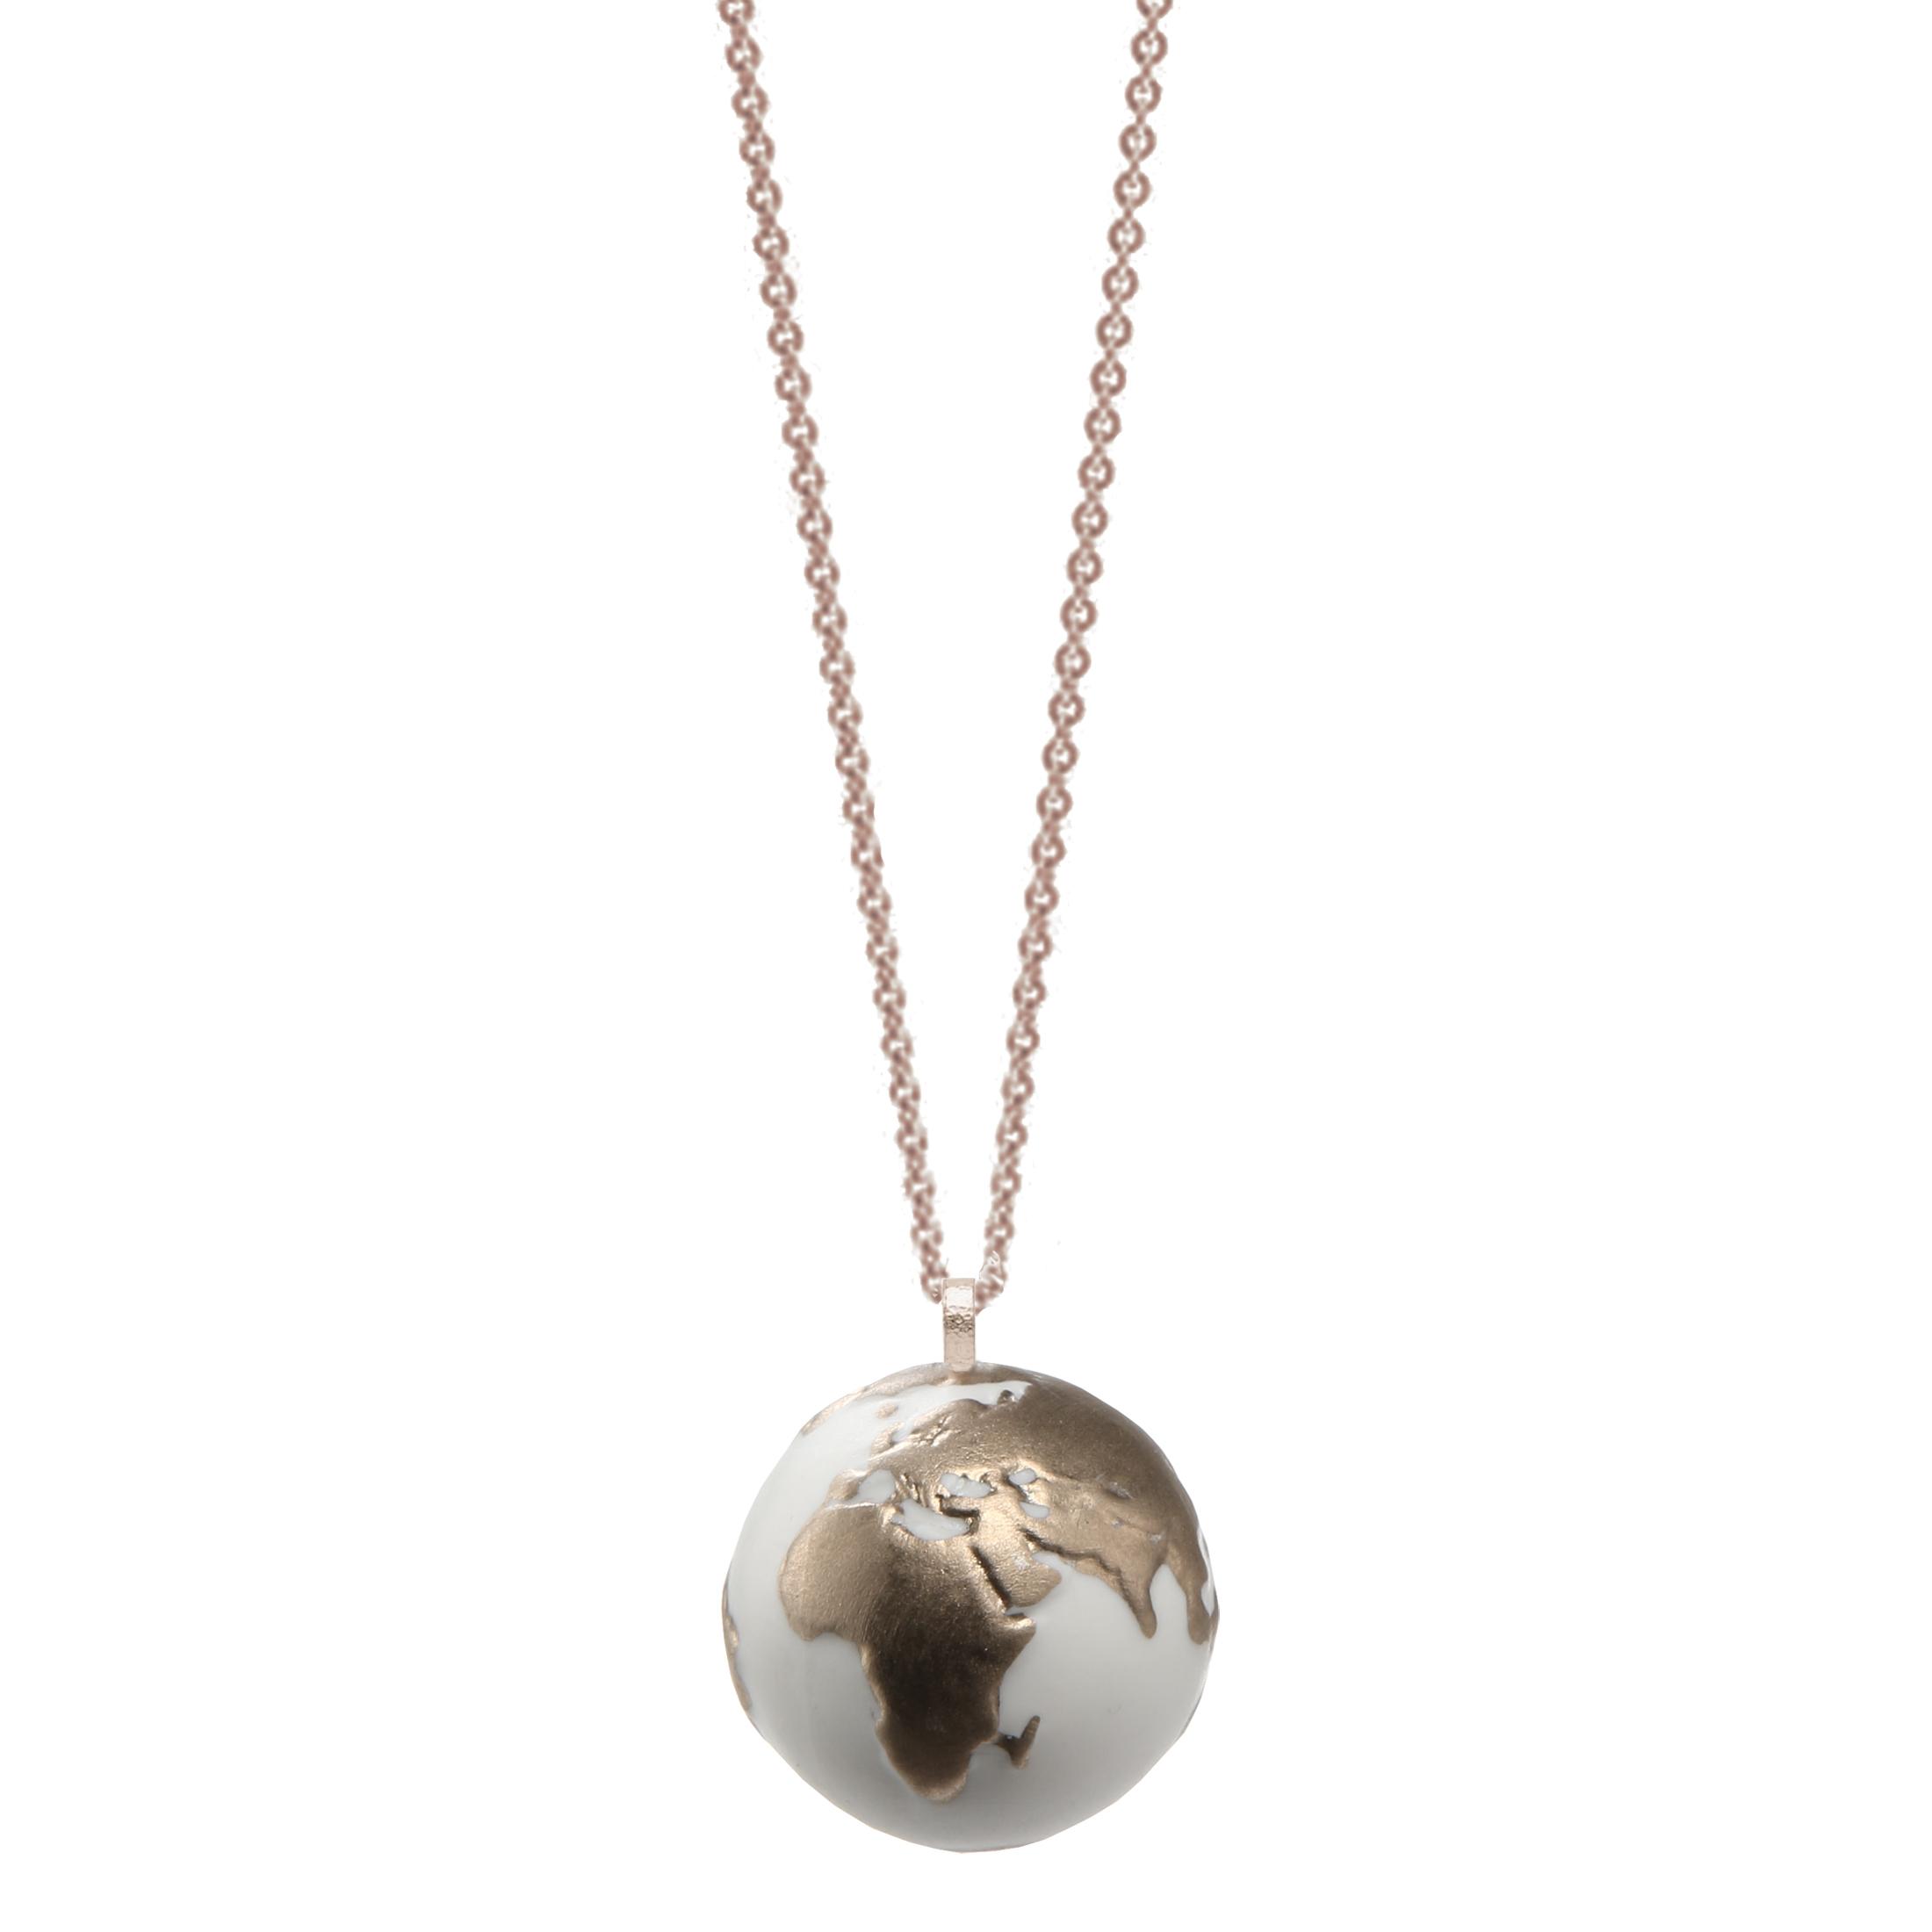 Goebel Kaiser Porzellan Globe 'KP P KE Globe Platin' 2021 !